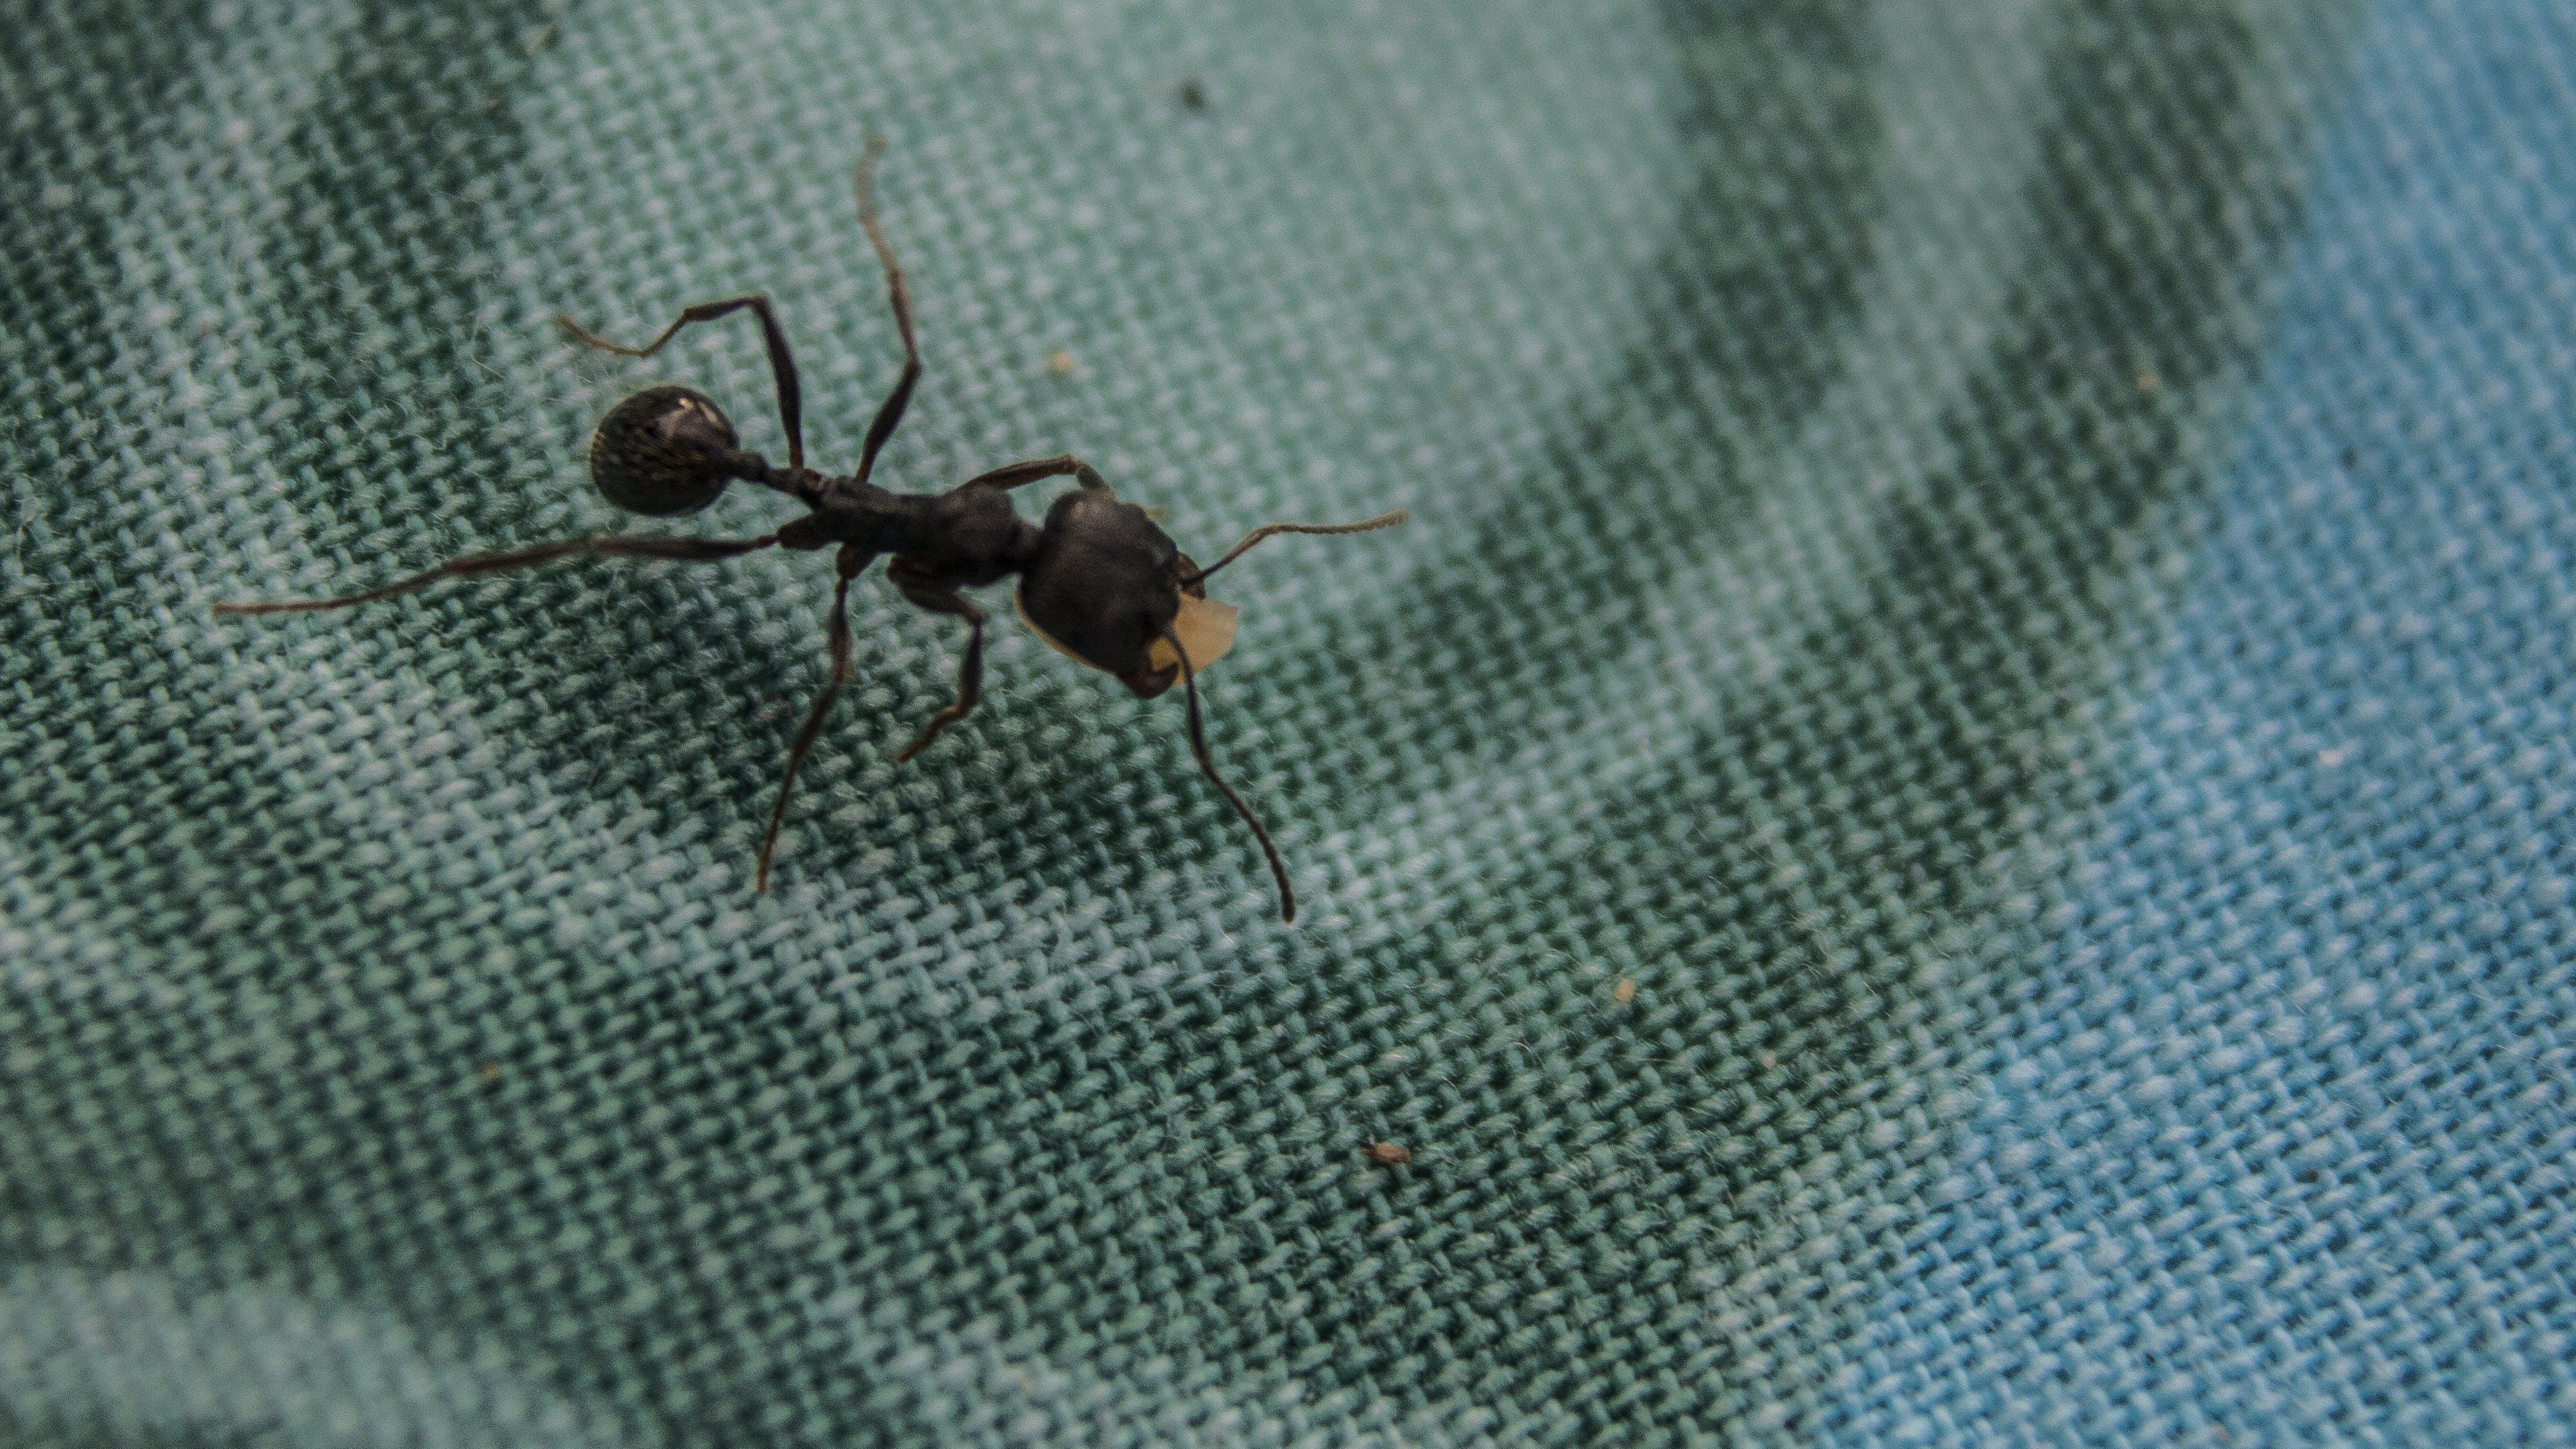 Free stock photo of animal, ant, black ant, bug